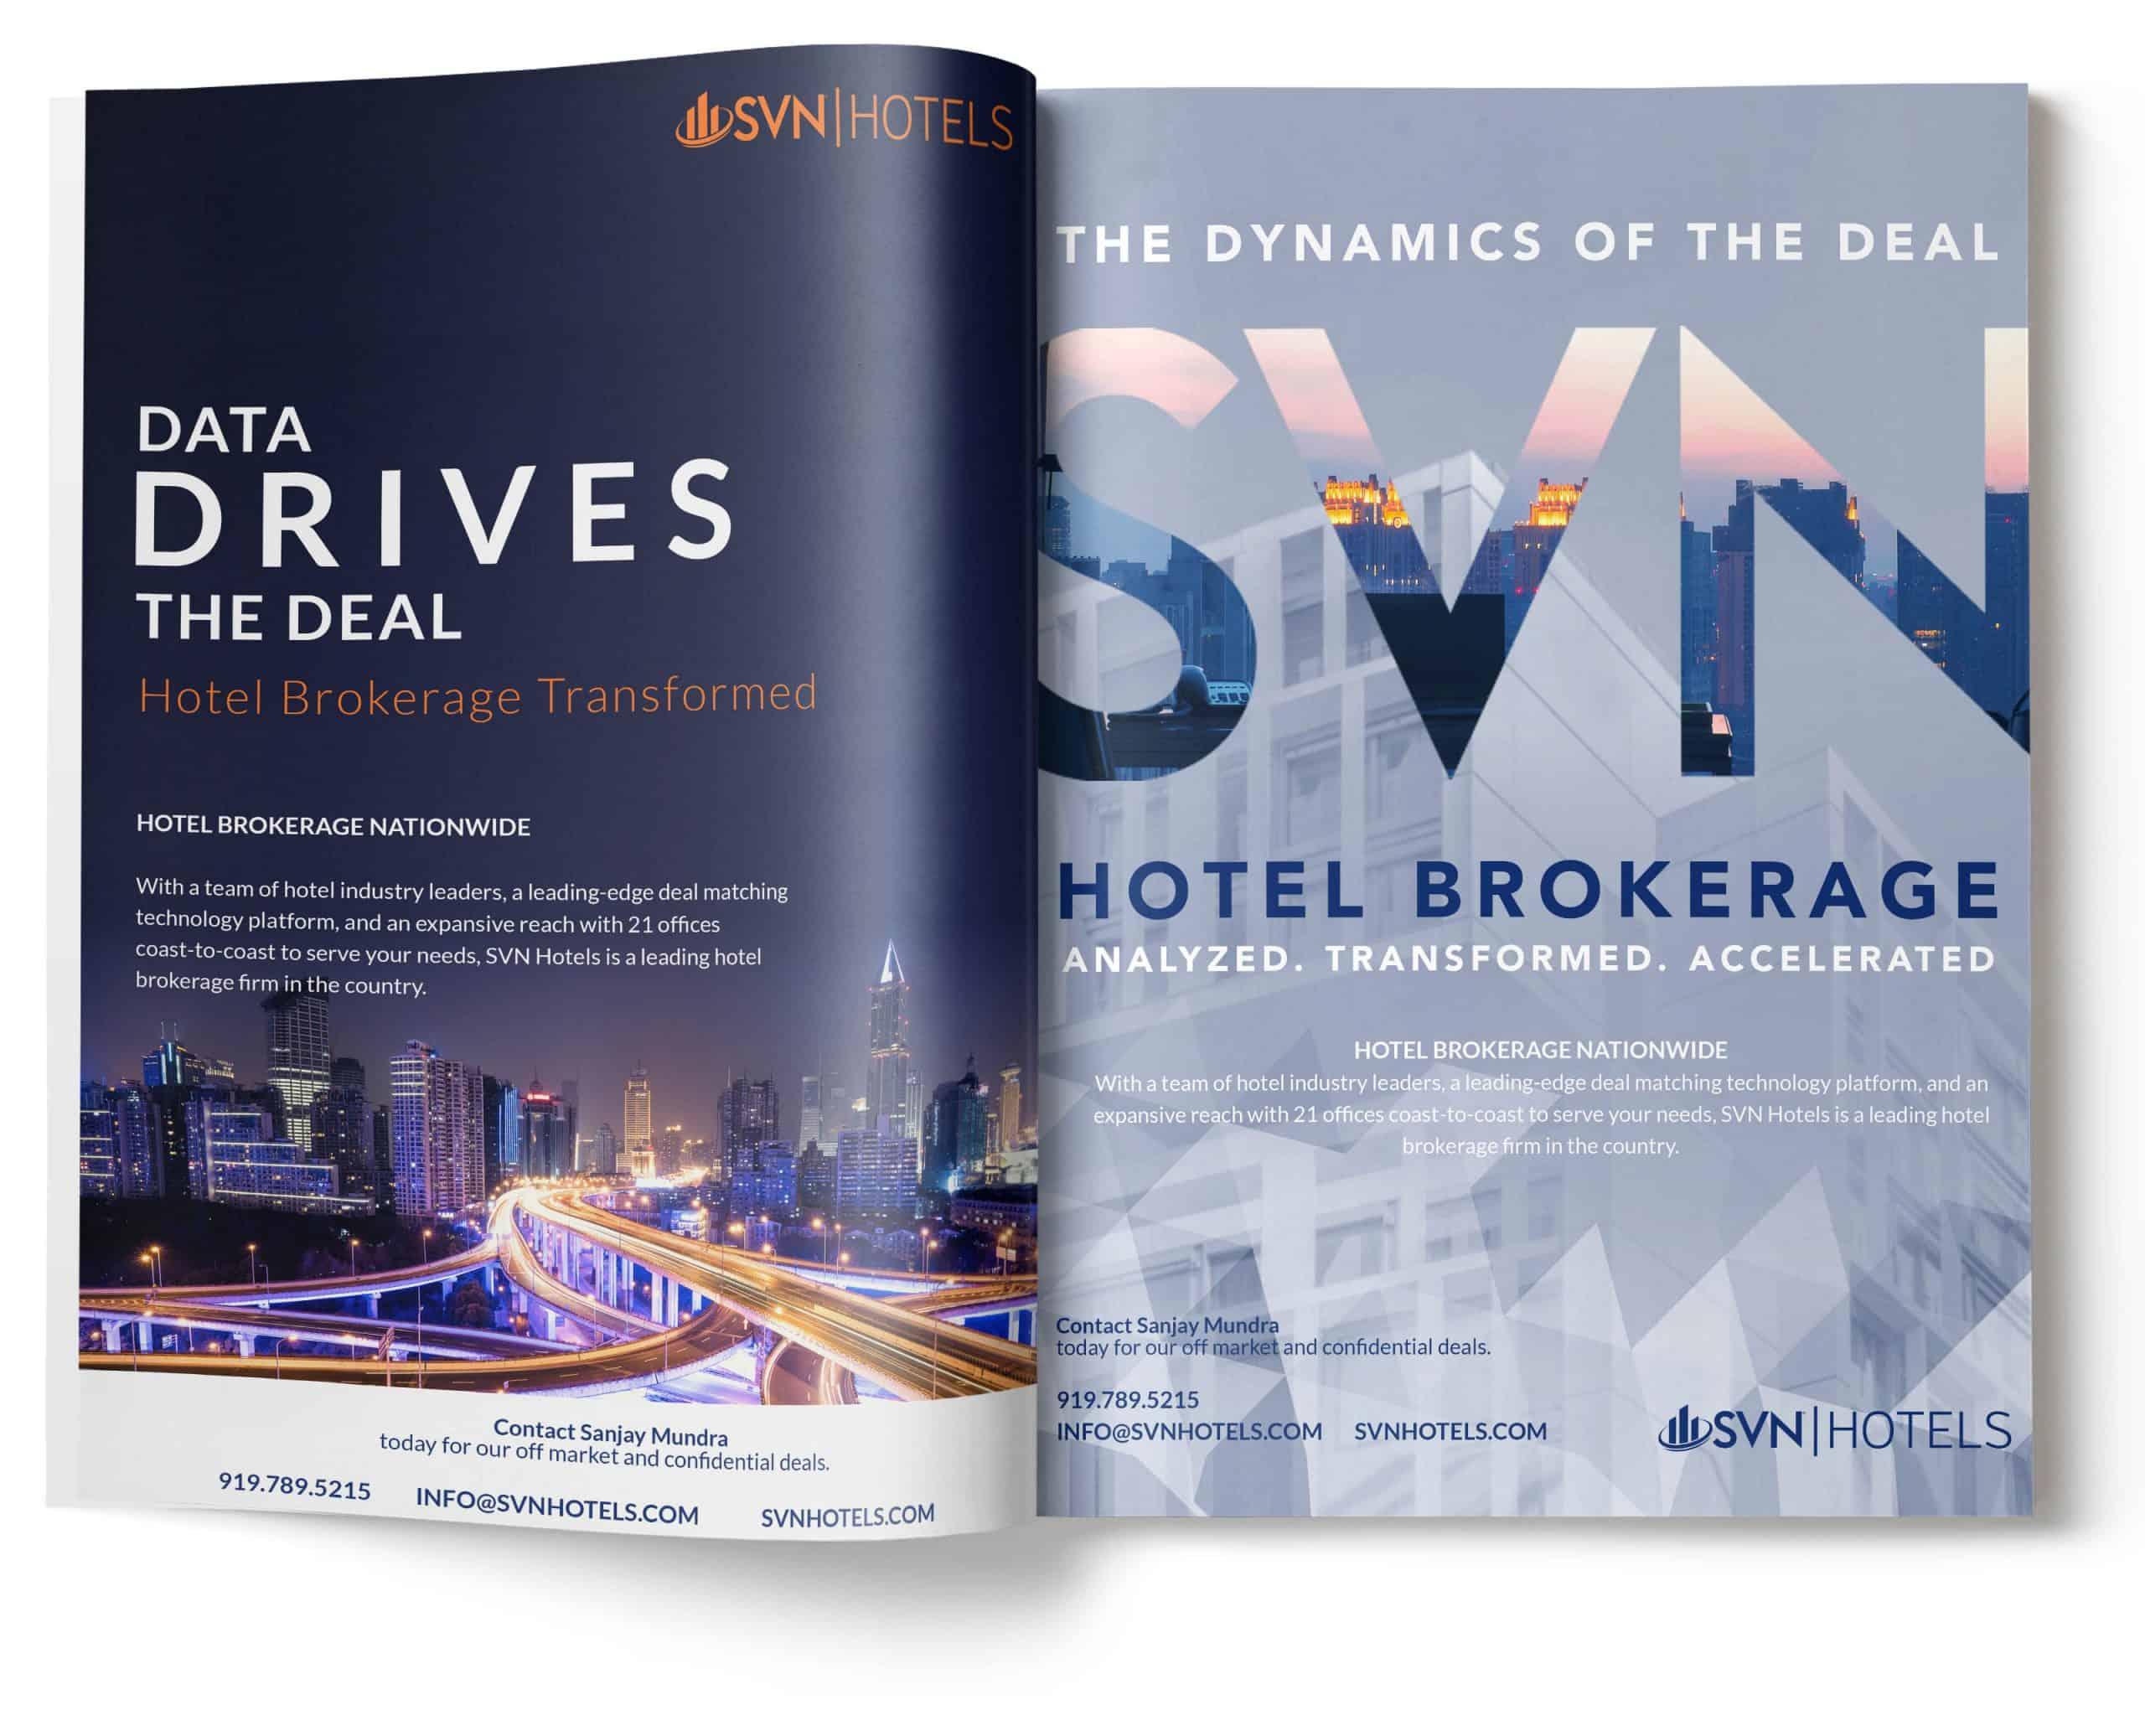 SVN Hotels Advertisements